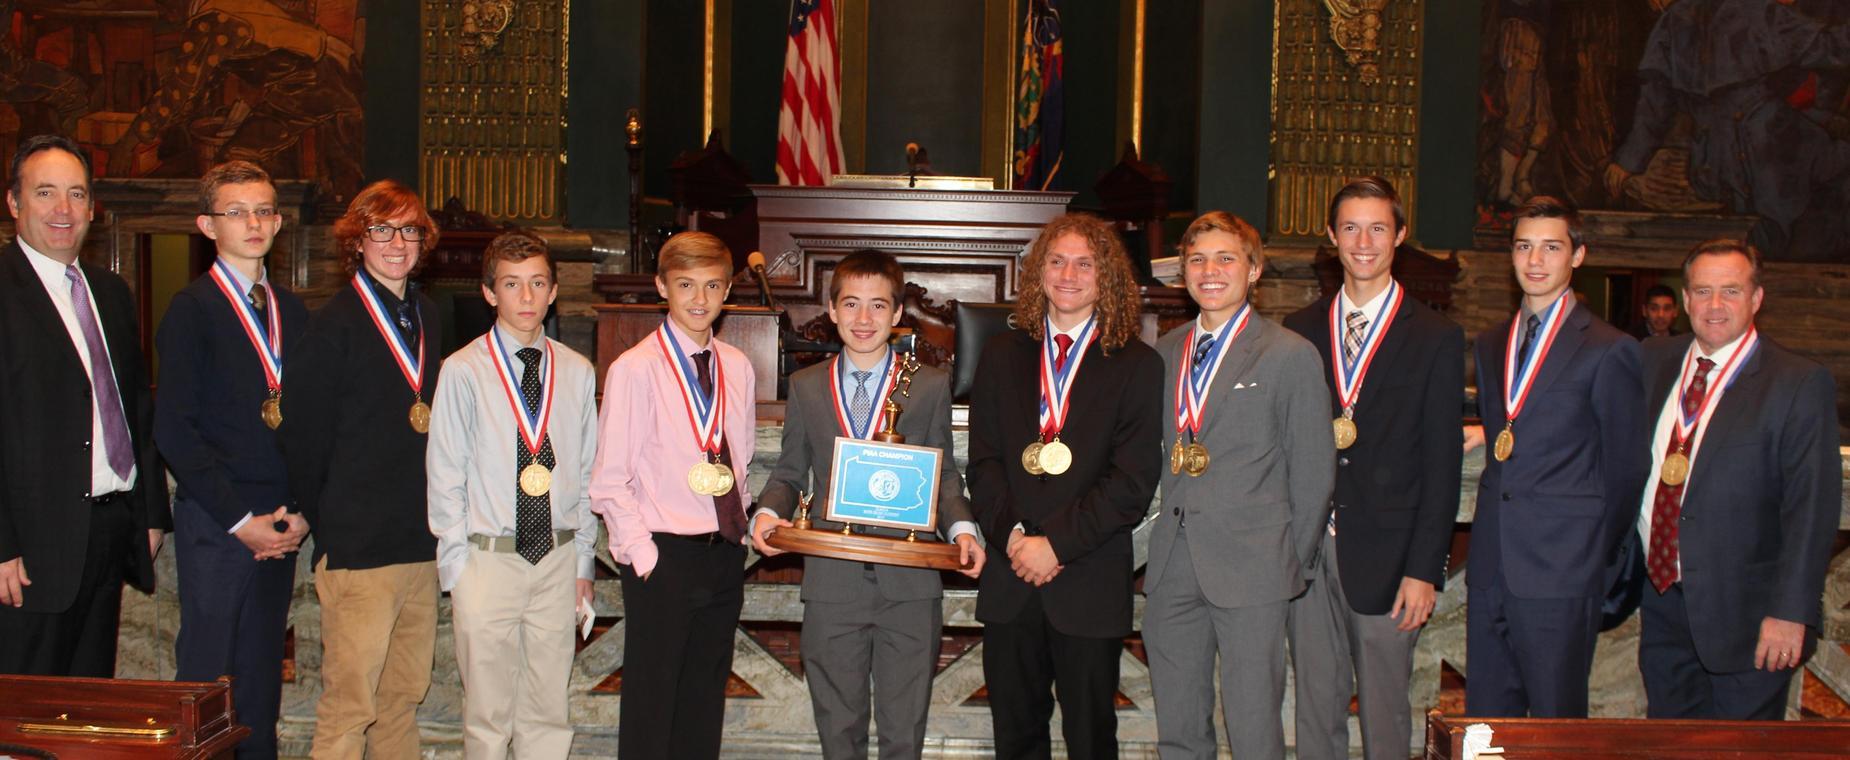 2017 PIAA Cross Country Champions in Harrisburg